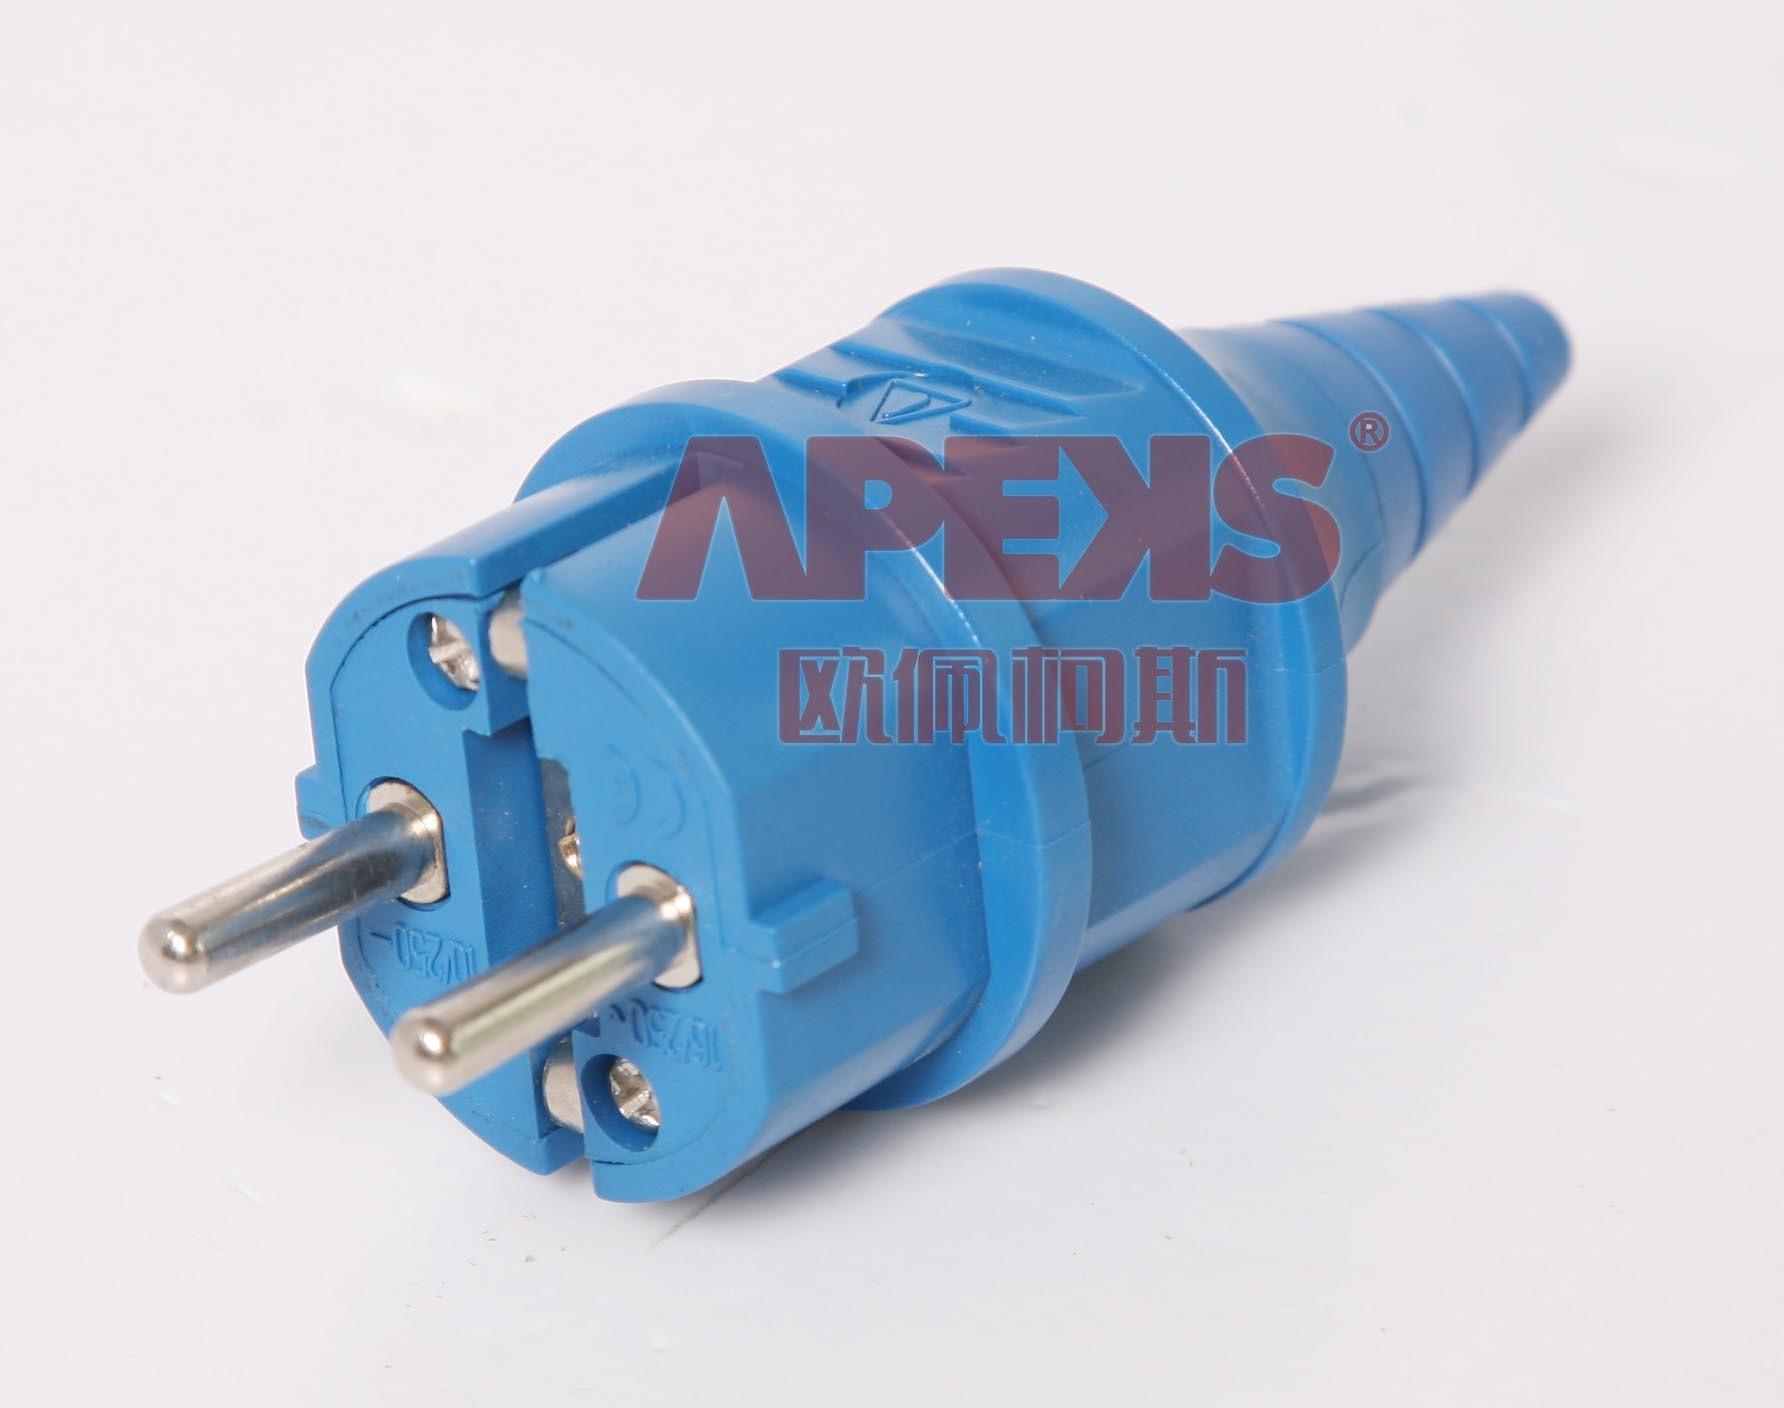 Schuko Series Plug (Schuko Plug)